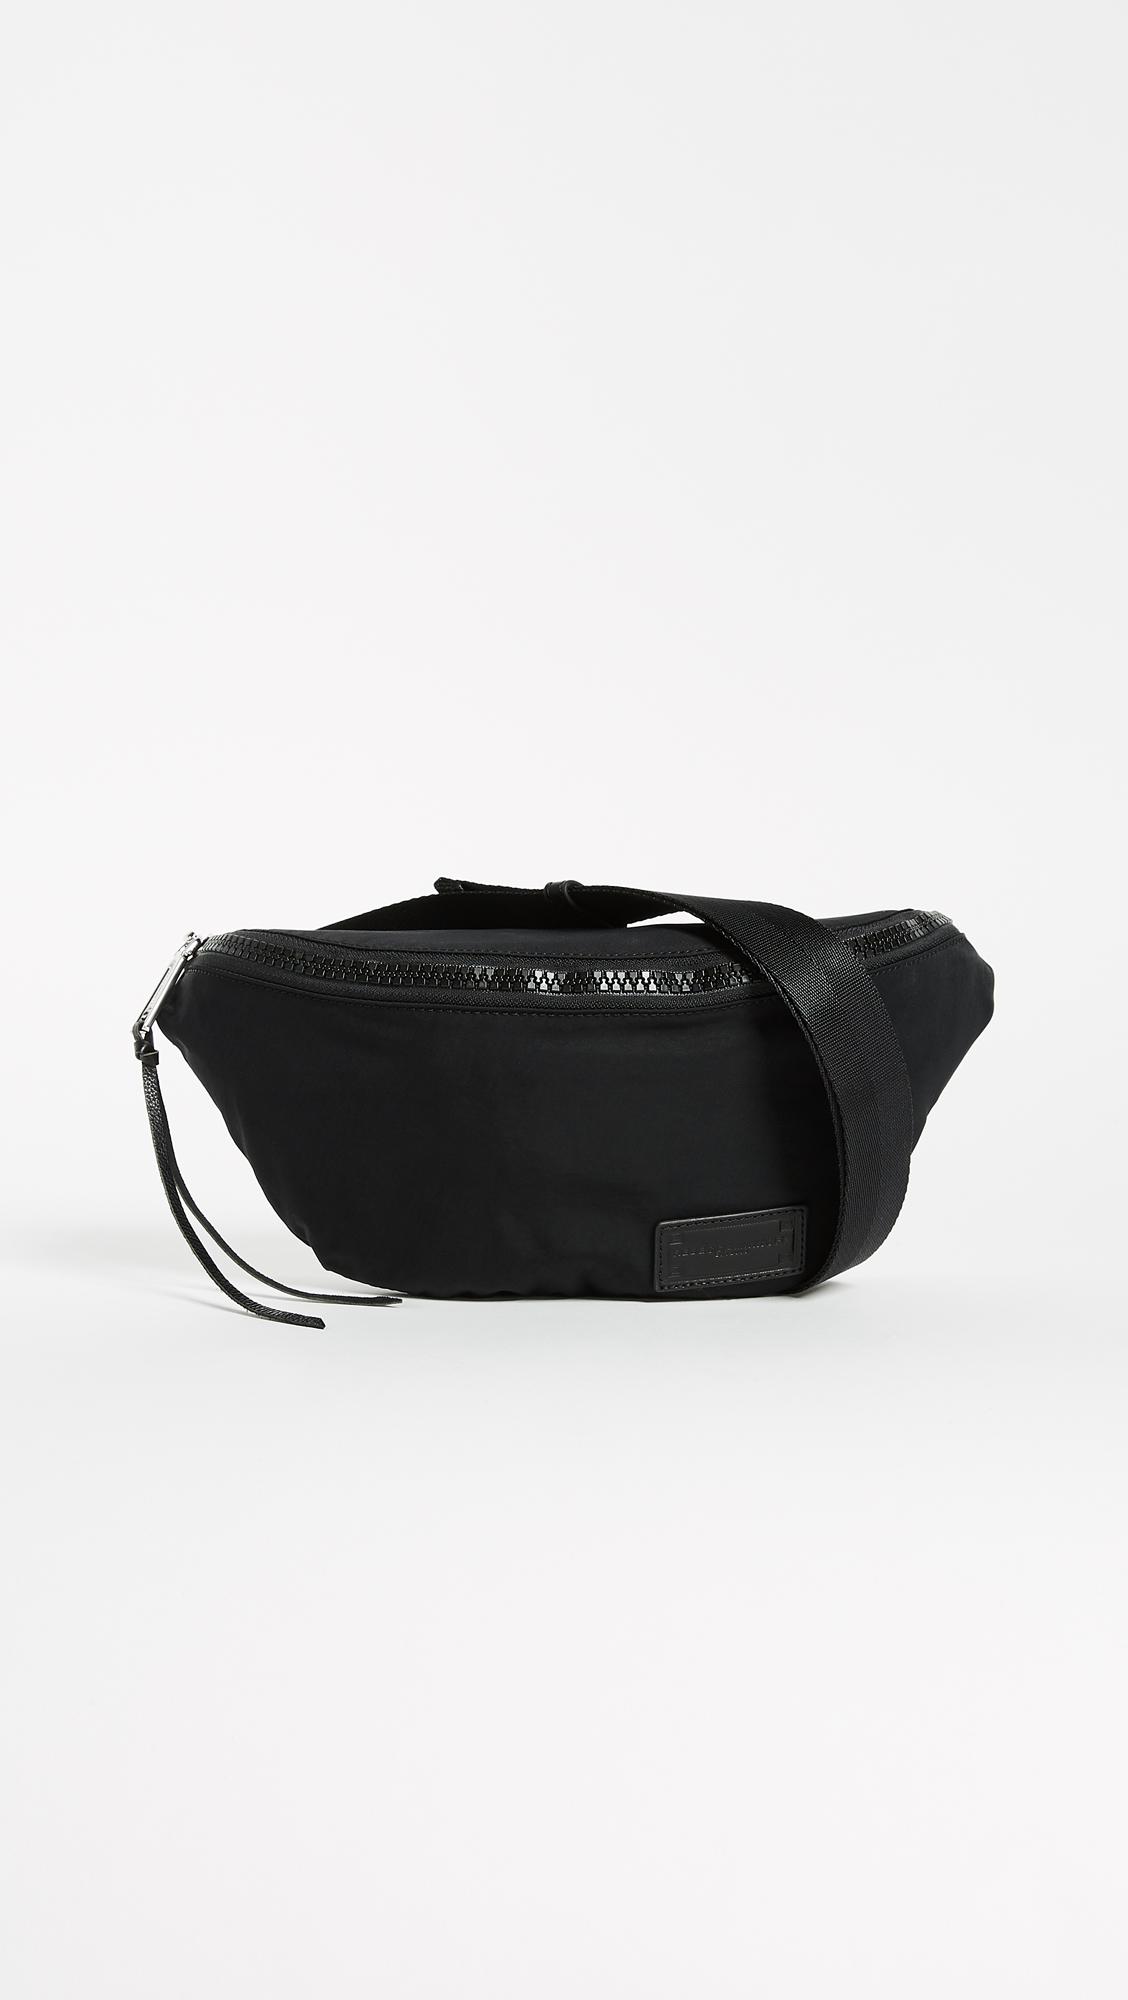 8f5513a3435 Rebecca Minkoff Nylon Belt Bag